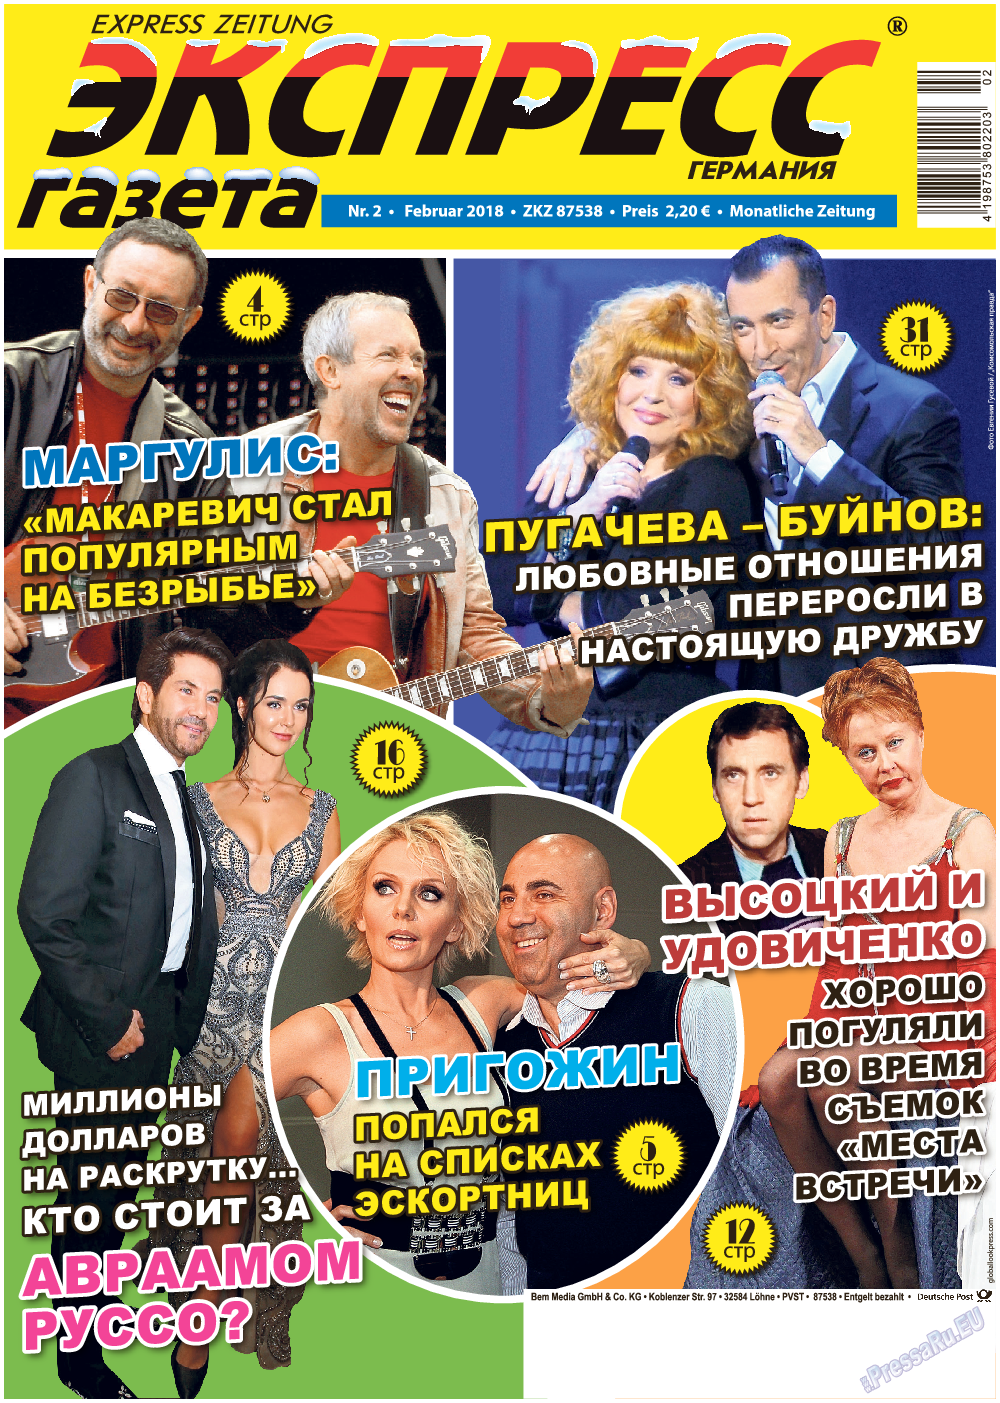 Экспресс газета (газета). 2018 год, номер 2, стр. 1